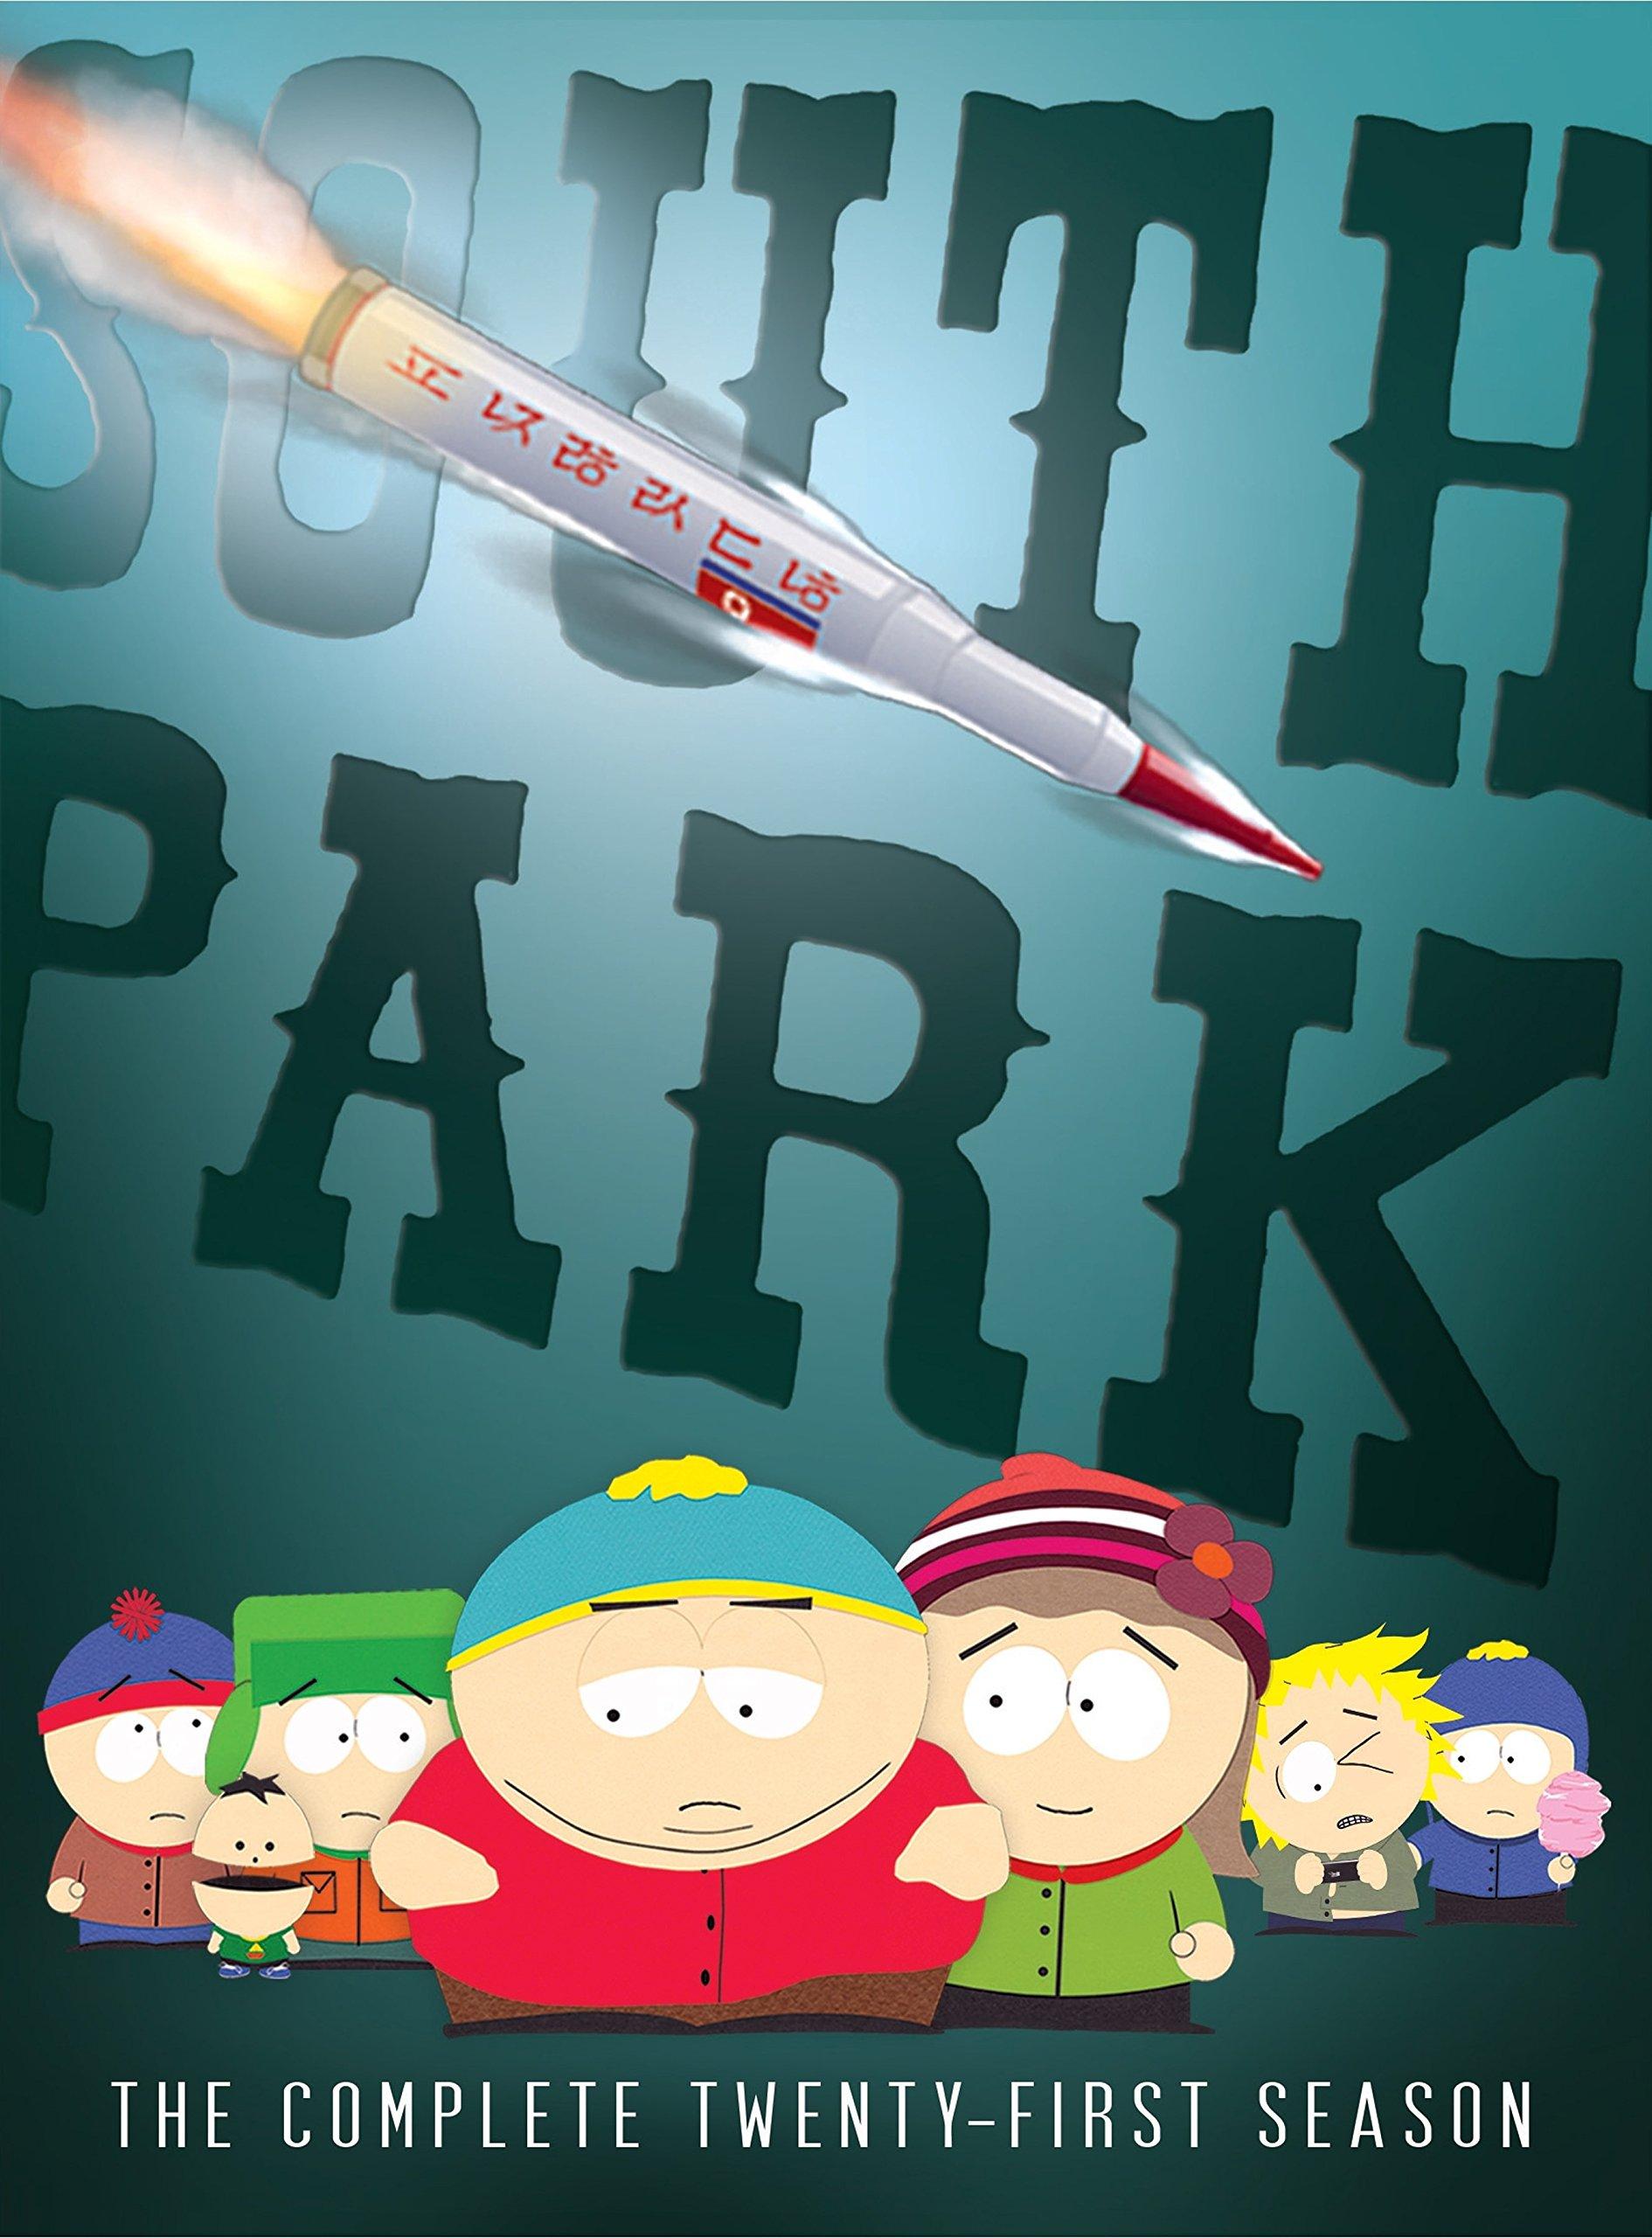 South Park: The Complete Twenty-First Season